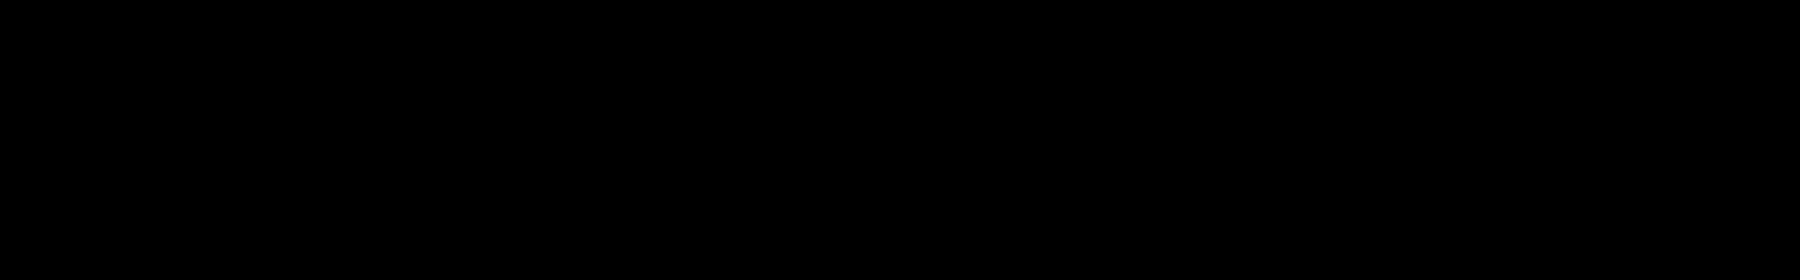 Rouge audio waveform